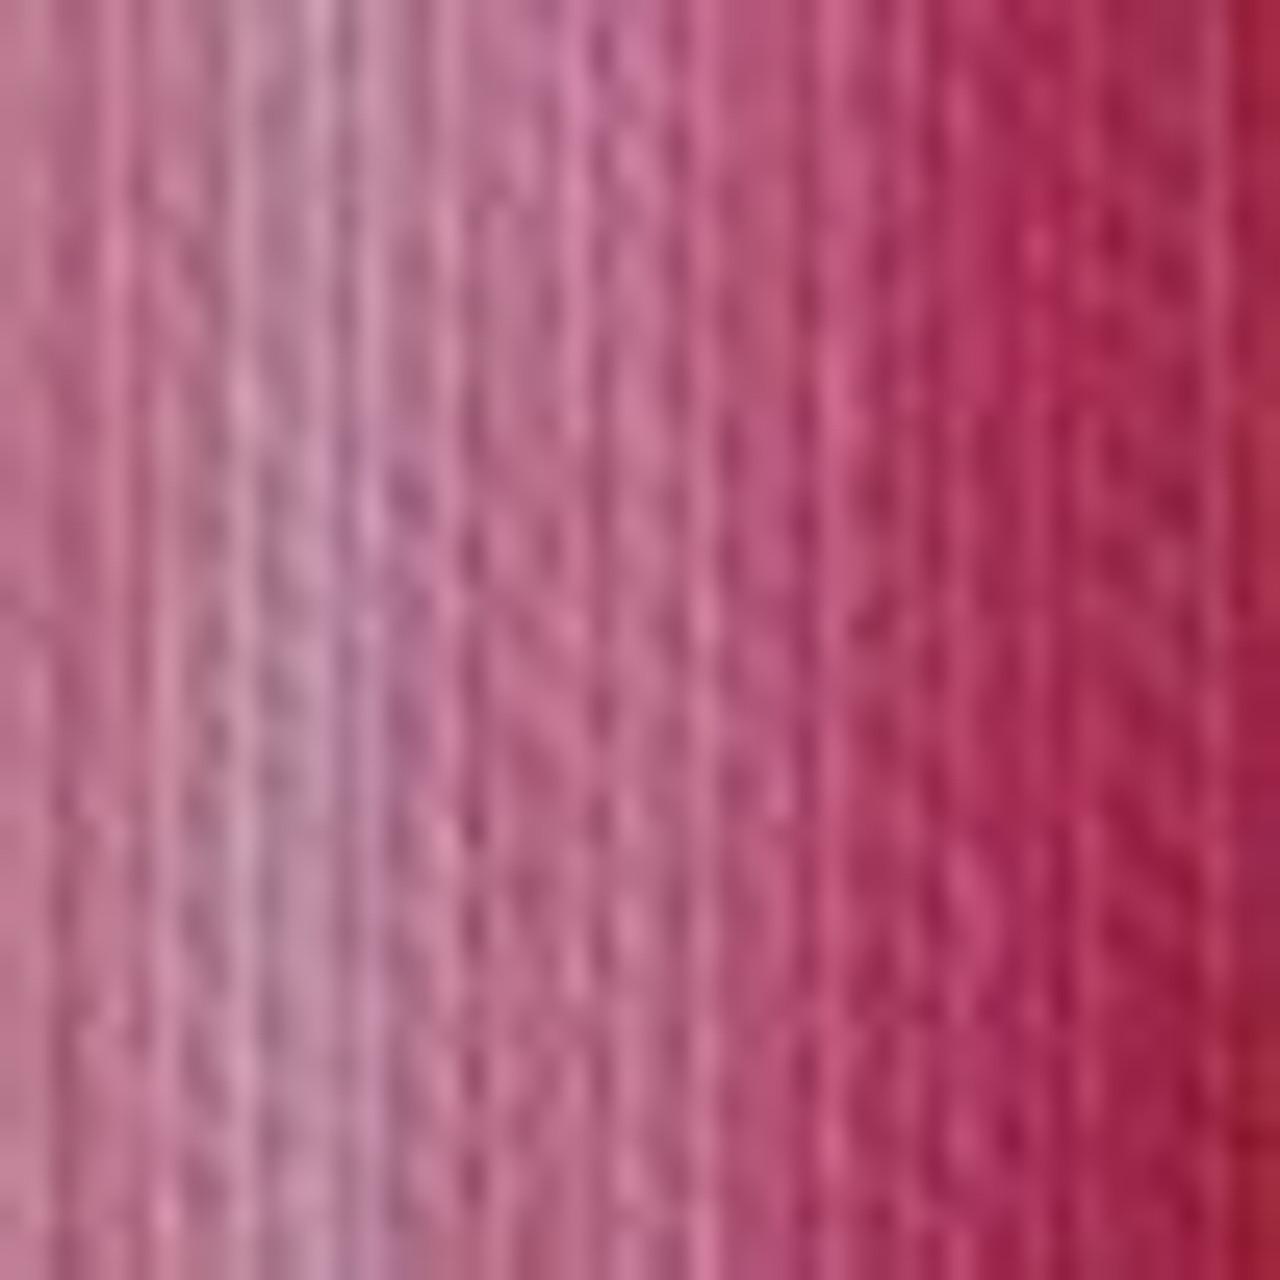 DMC # 48 Variegated Baby Pink Floss / Thread